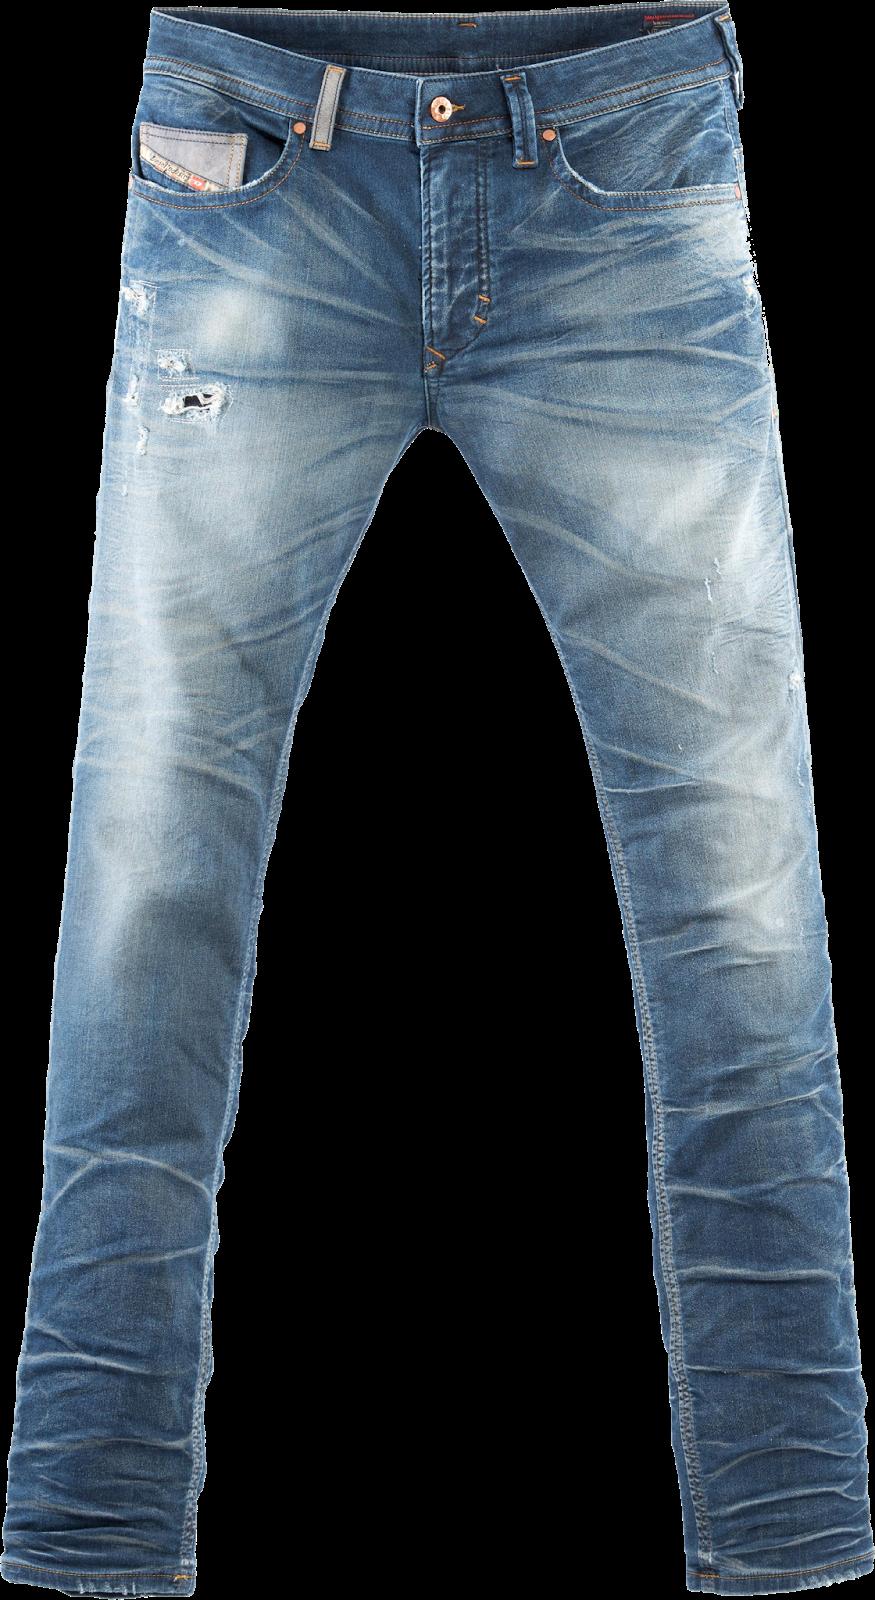 Blue Jeans PNG HD - 141240